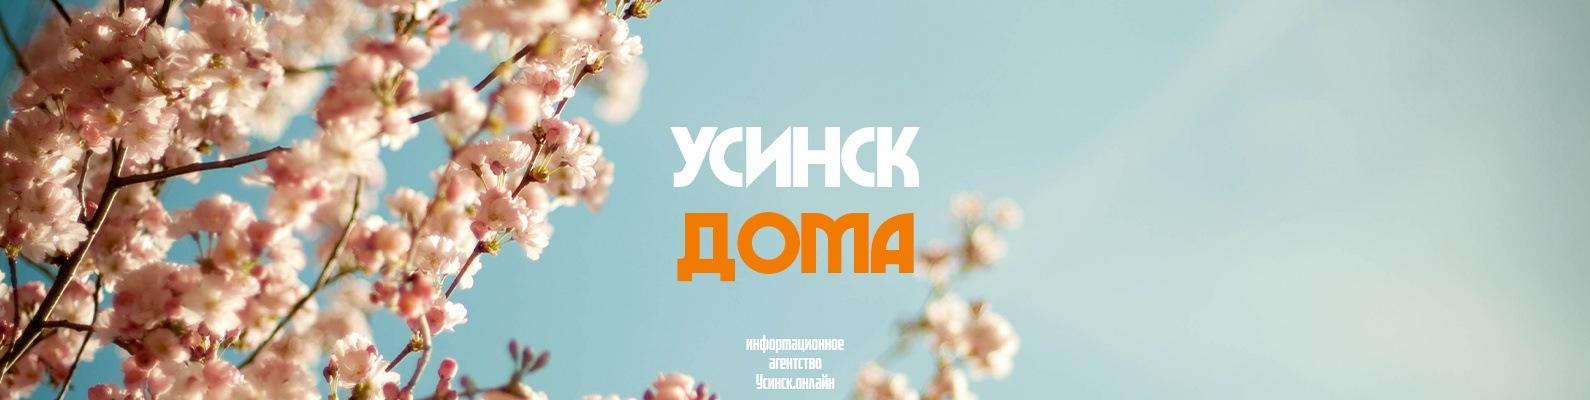 Усинск.Онлайн   ВКонтакте